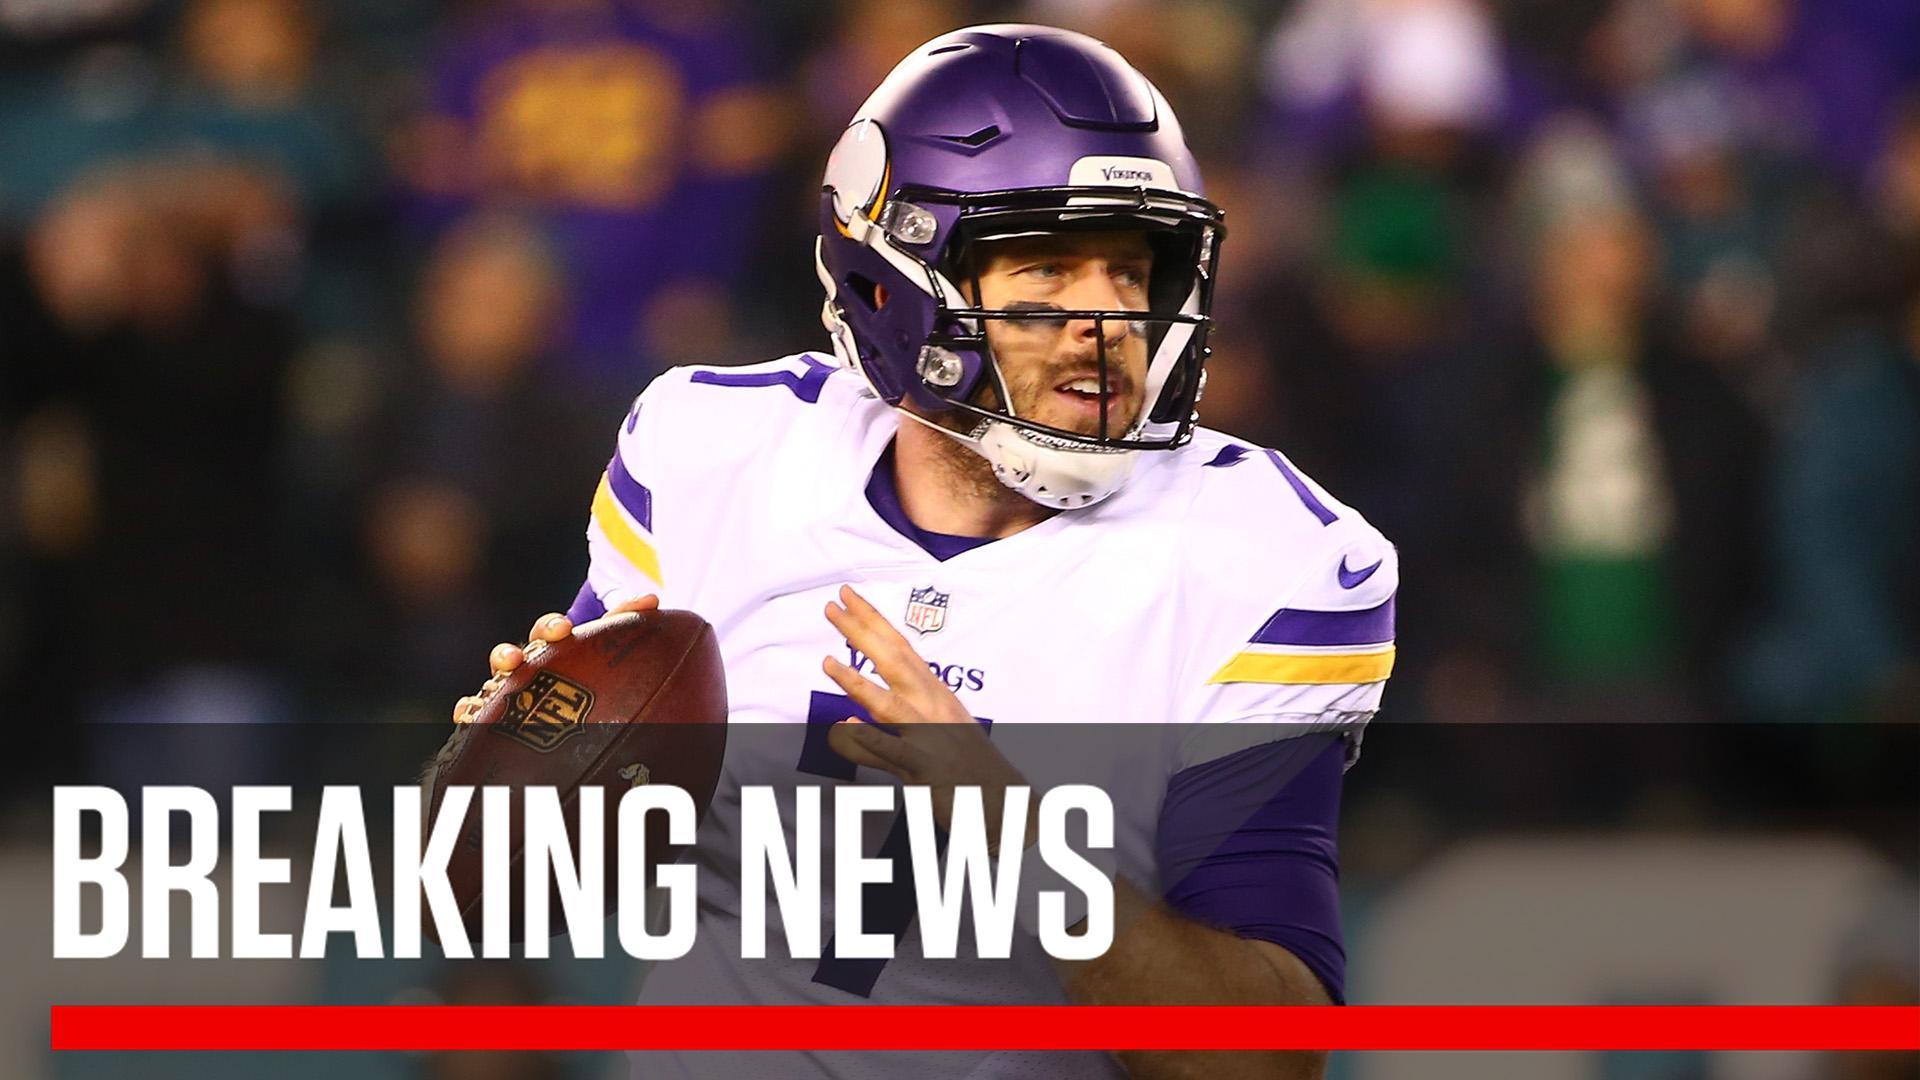 Breaking: Case Keenum intends to sign with the Denver Broncos, sources tell @AdamSchefter. https://t.co/yAJkZtzcfr